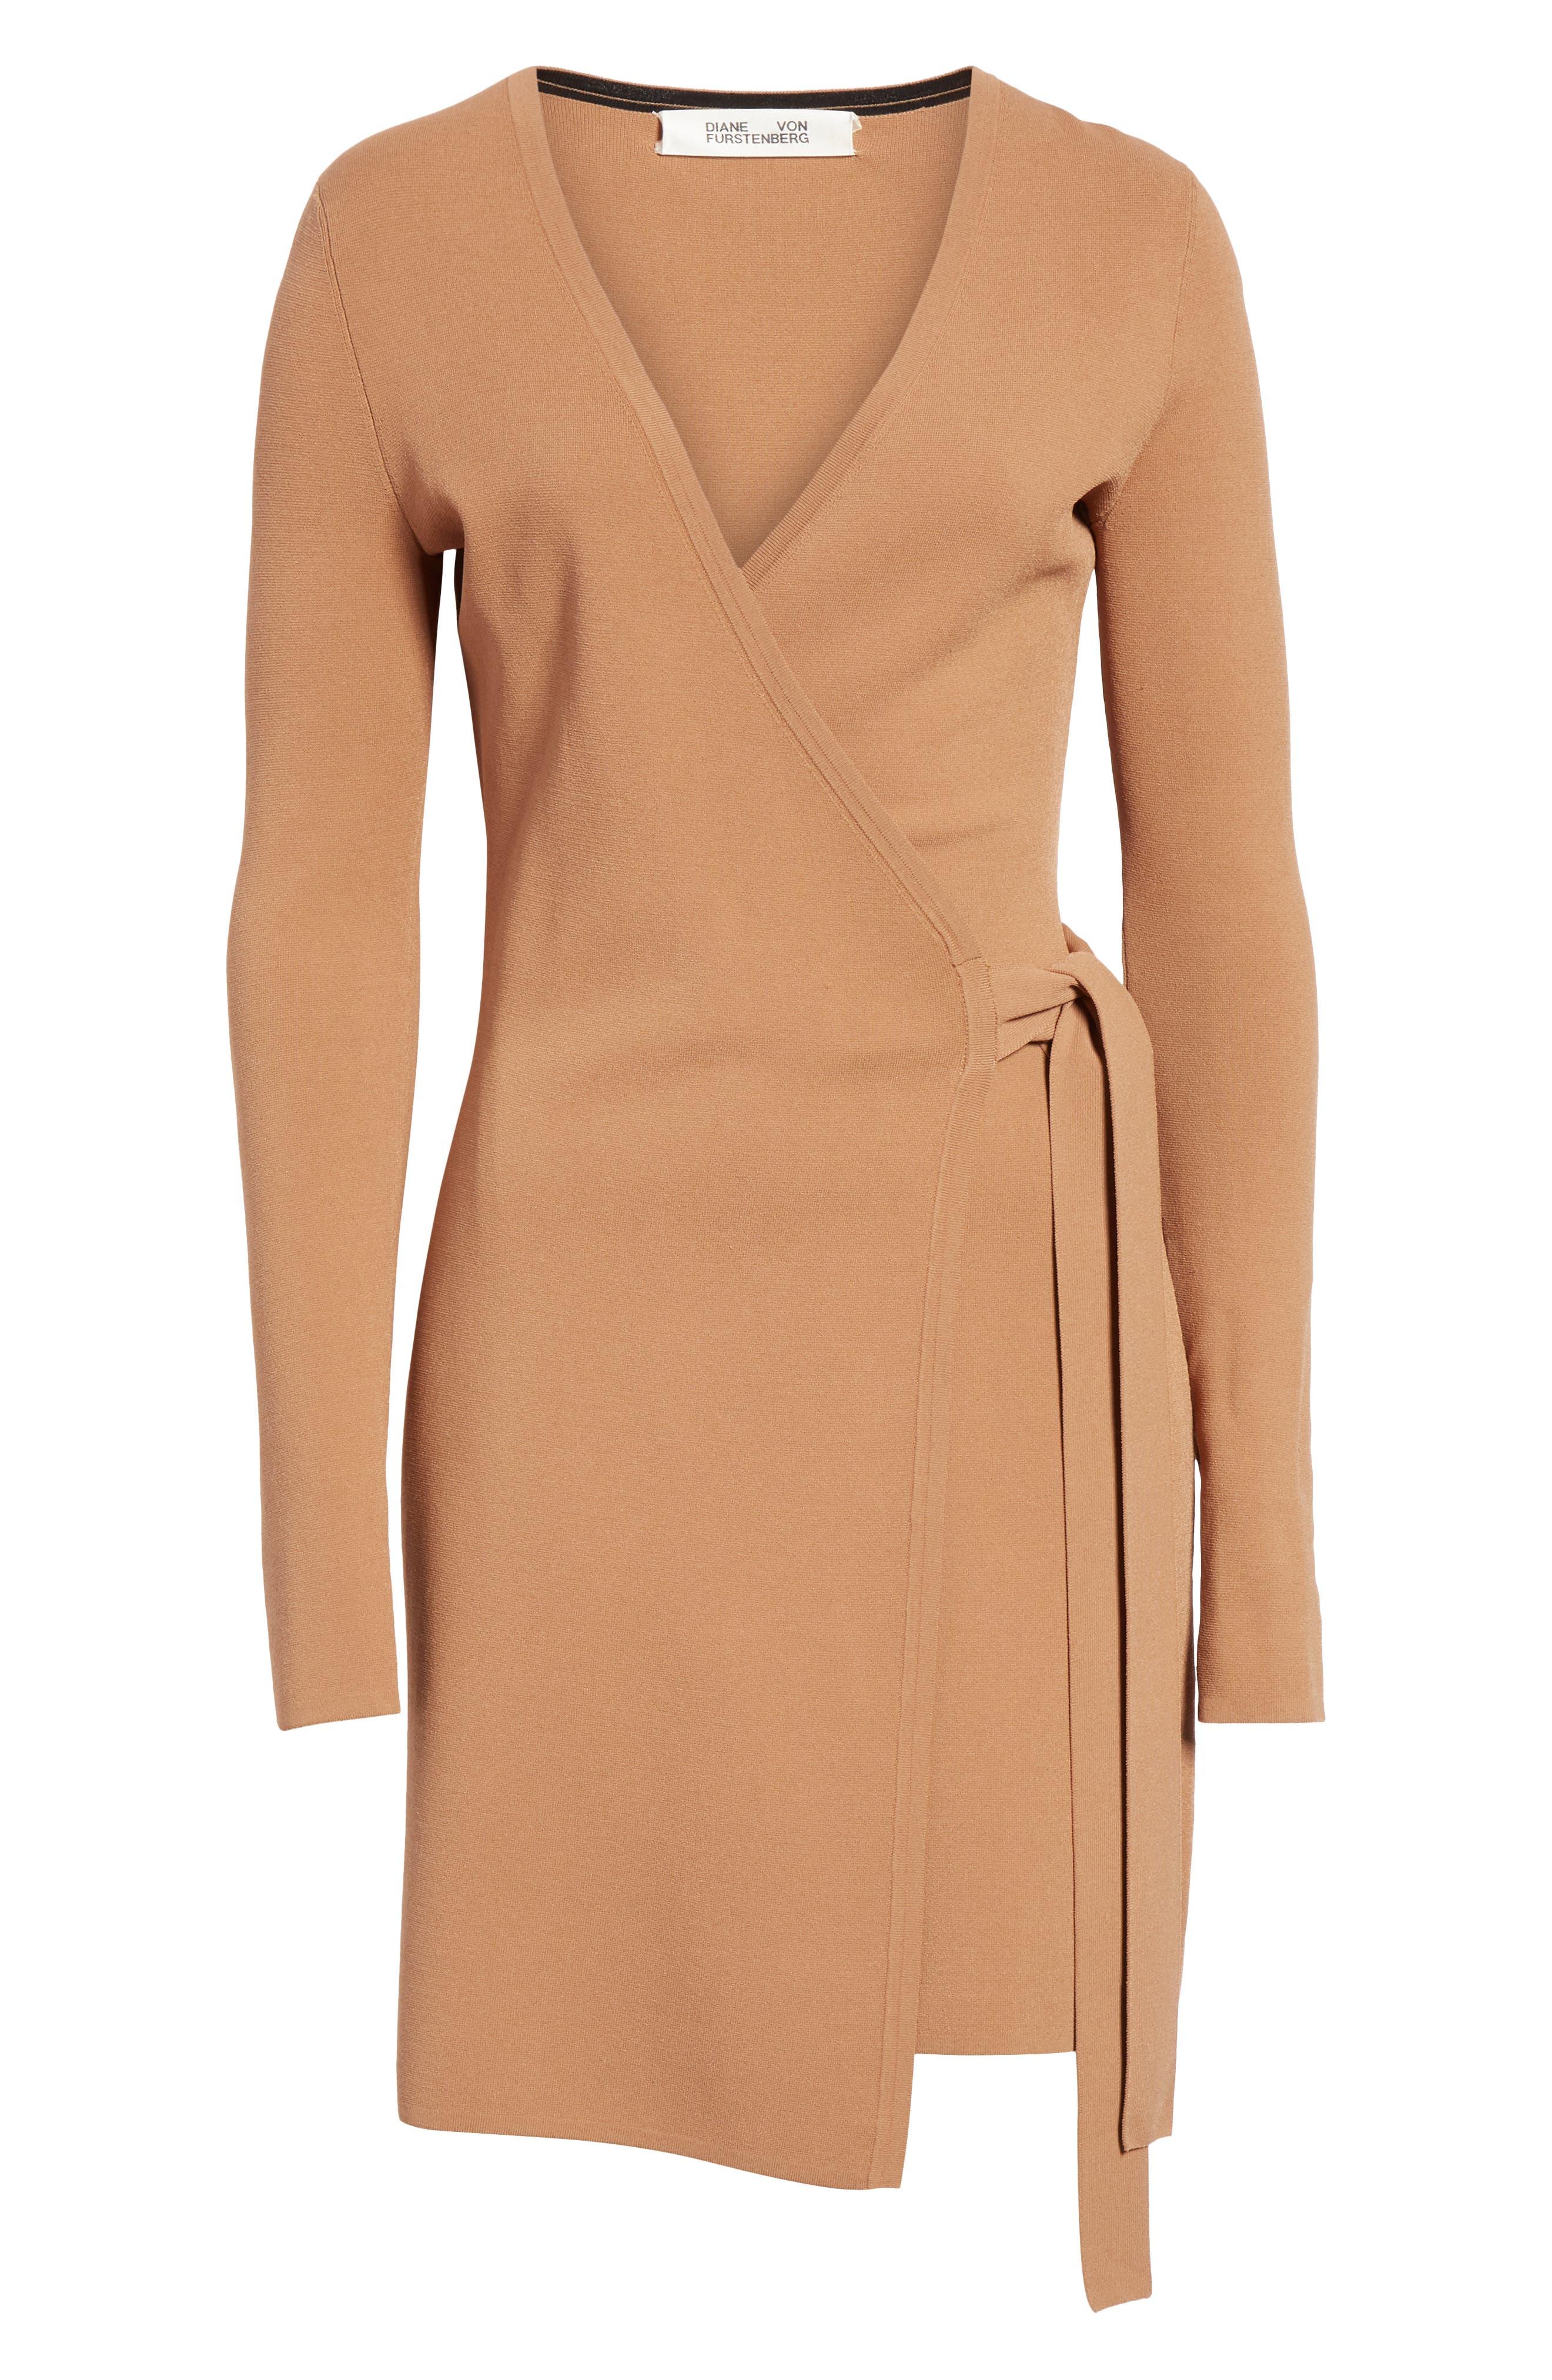 Diane von Furstenberg Knit Wrap Dress,                             Alternate thumbnail 6, color,                             WALNUT